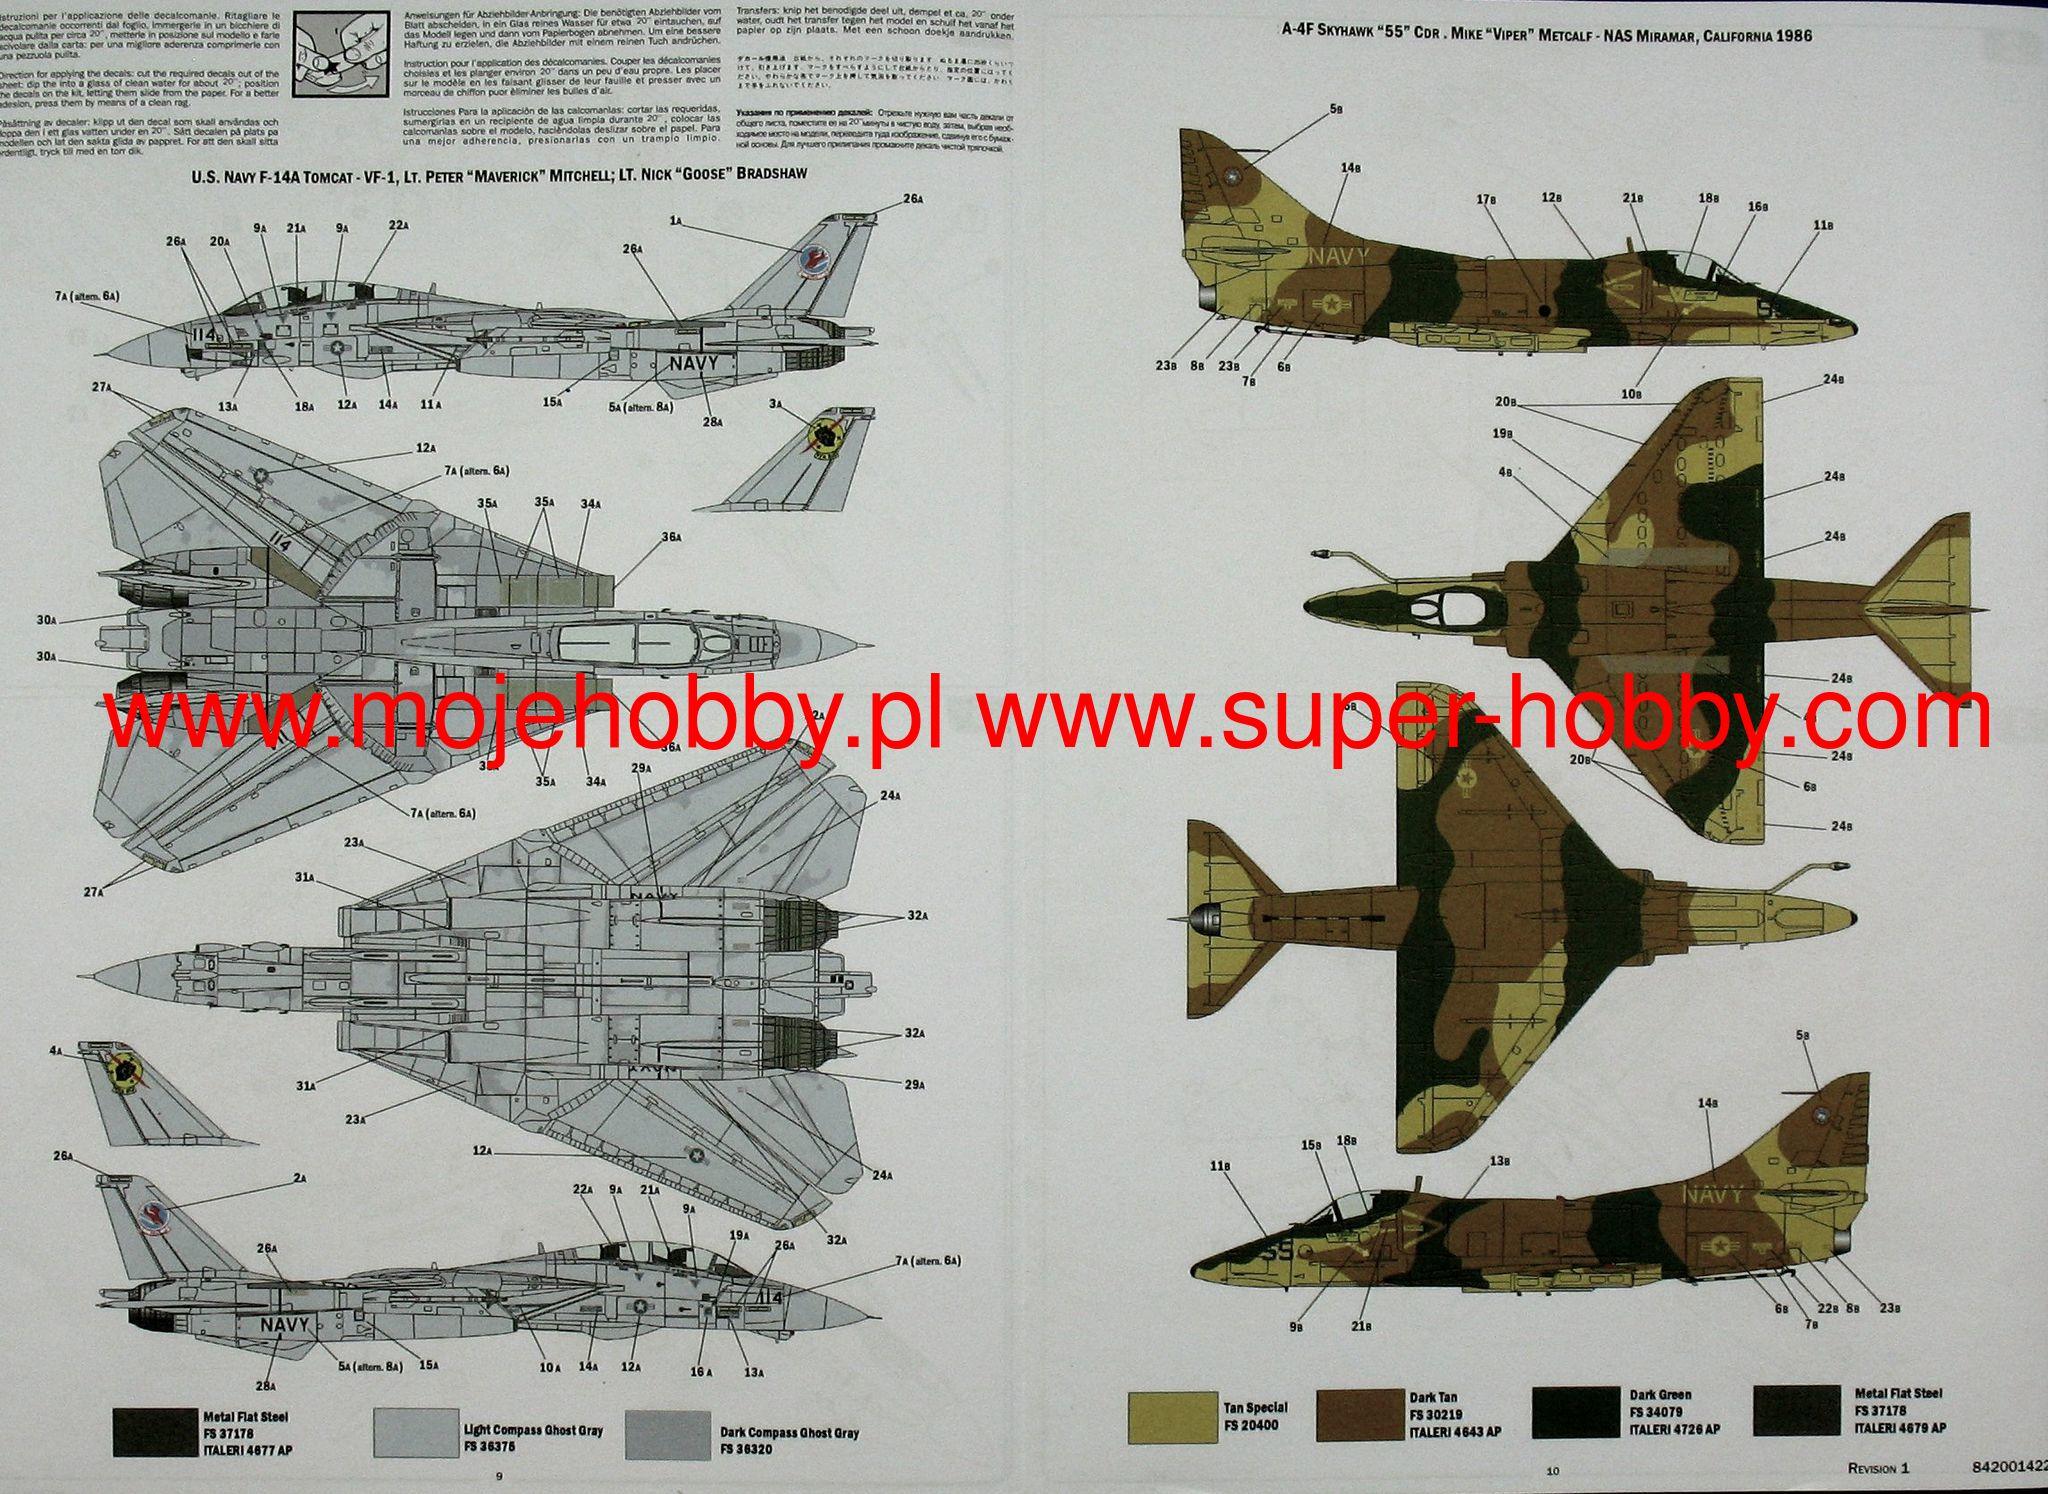 Us Navy Fighter Weapons School Top Gun F-14A Vs A4M Kit ITALERI 1:72 IT1422